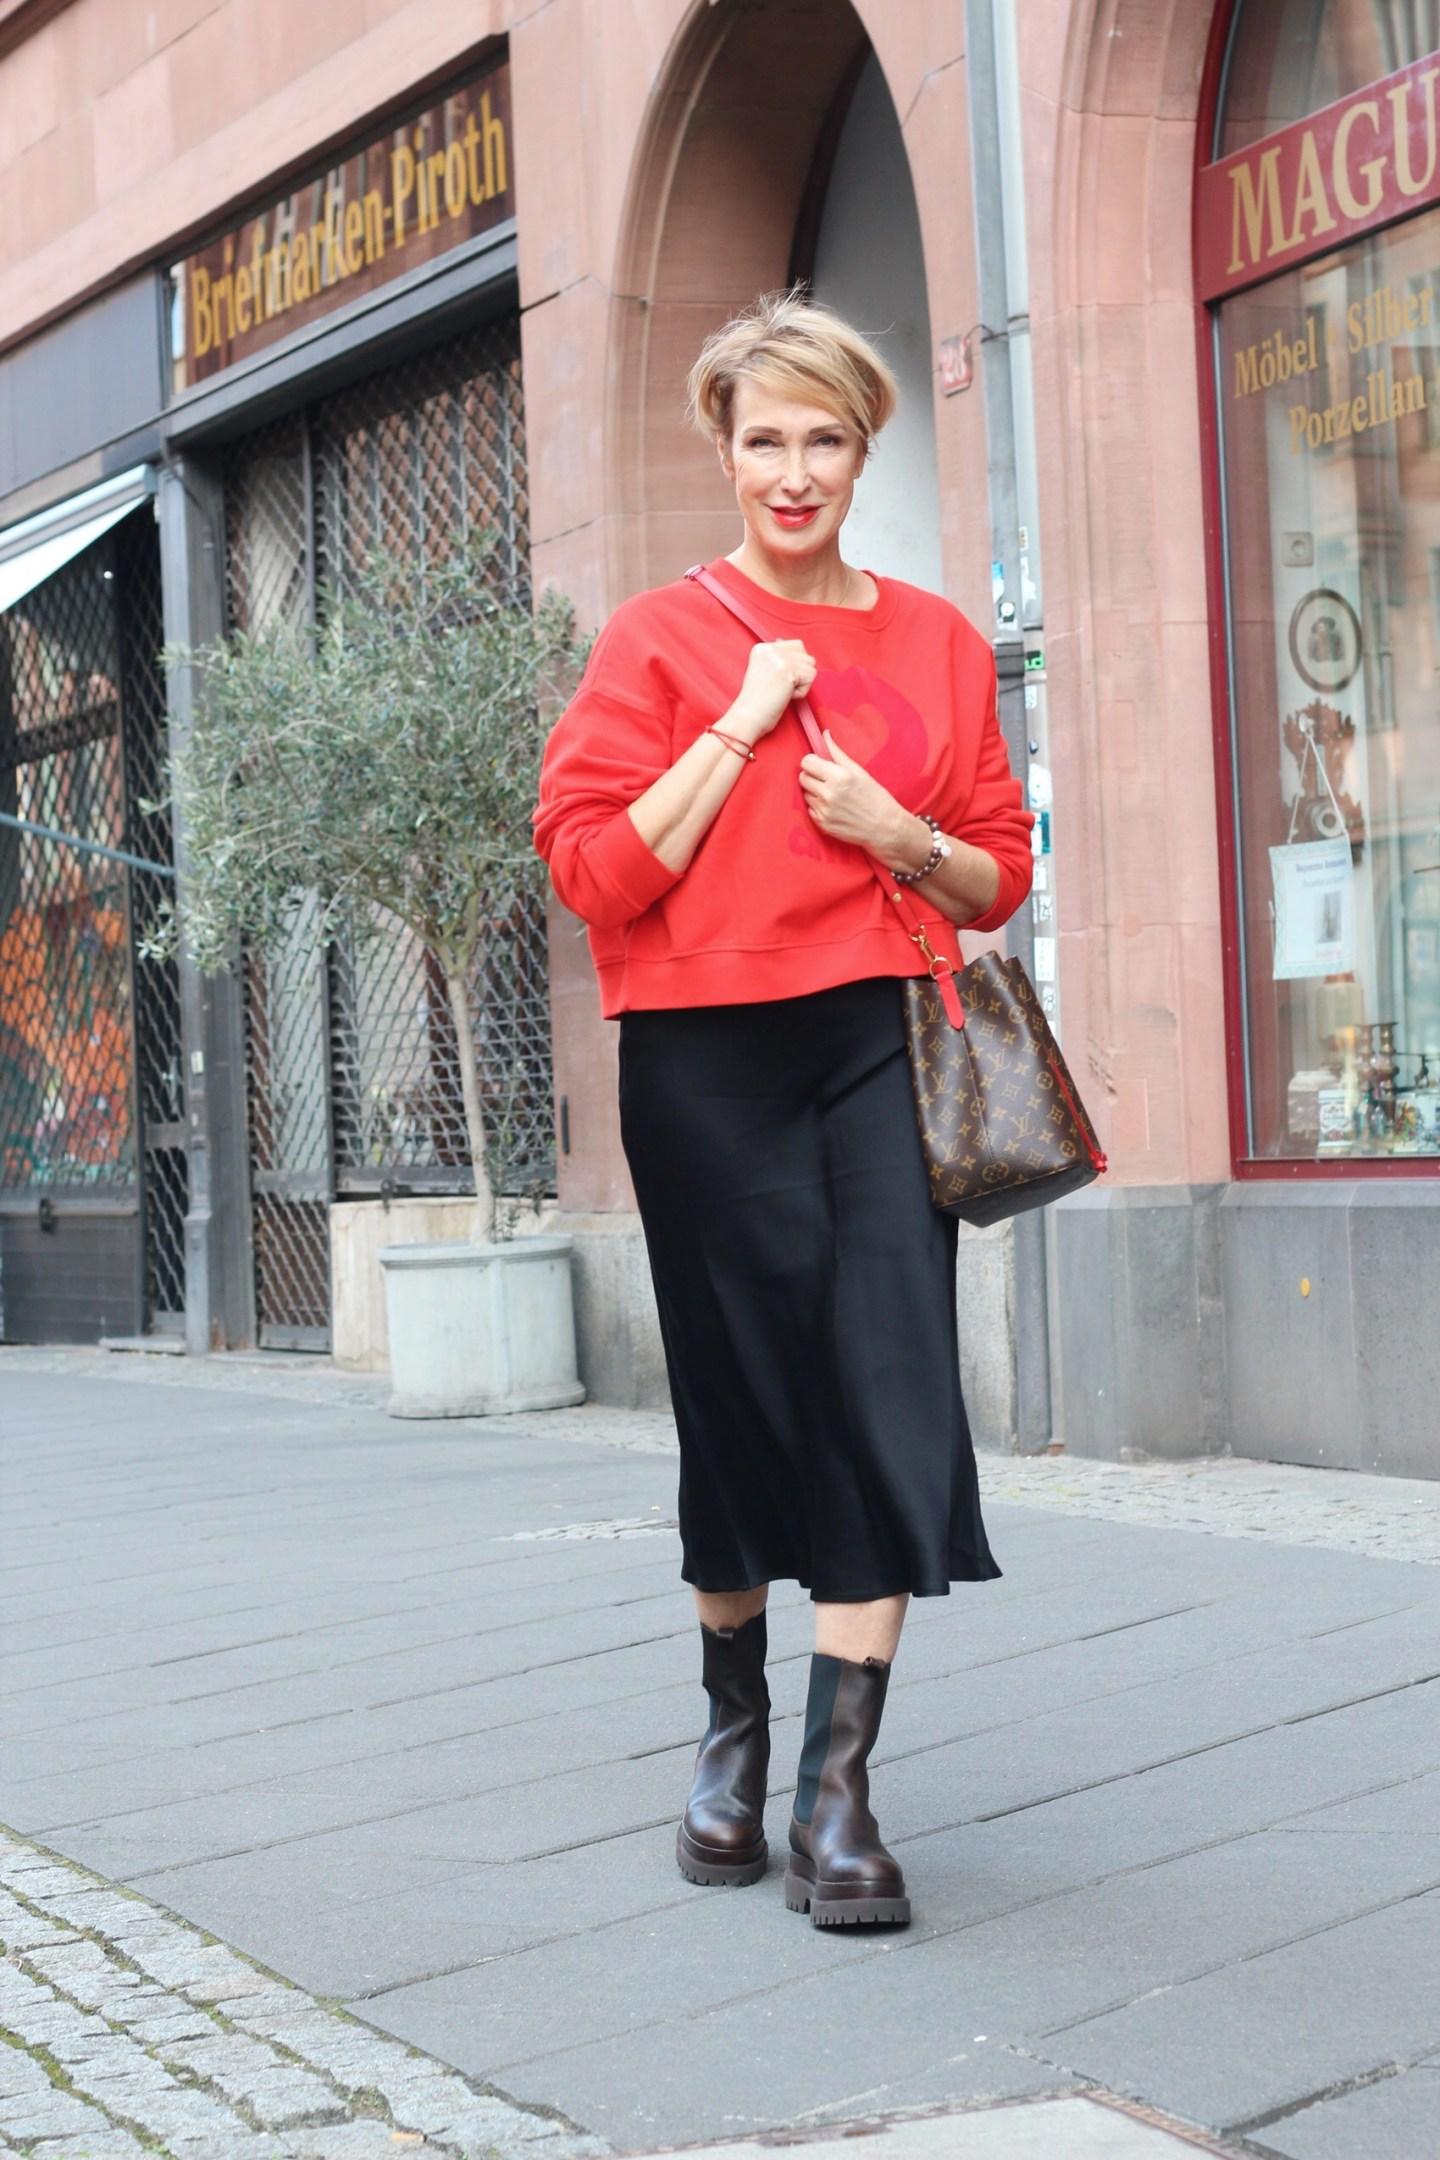 glamupyourlifestyle selbstoptimierung Chelsea-Boots ue-40-blog ue-50-blog